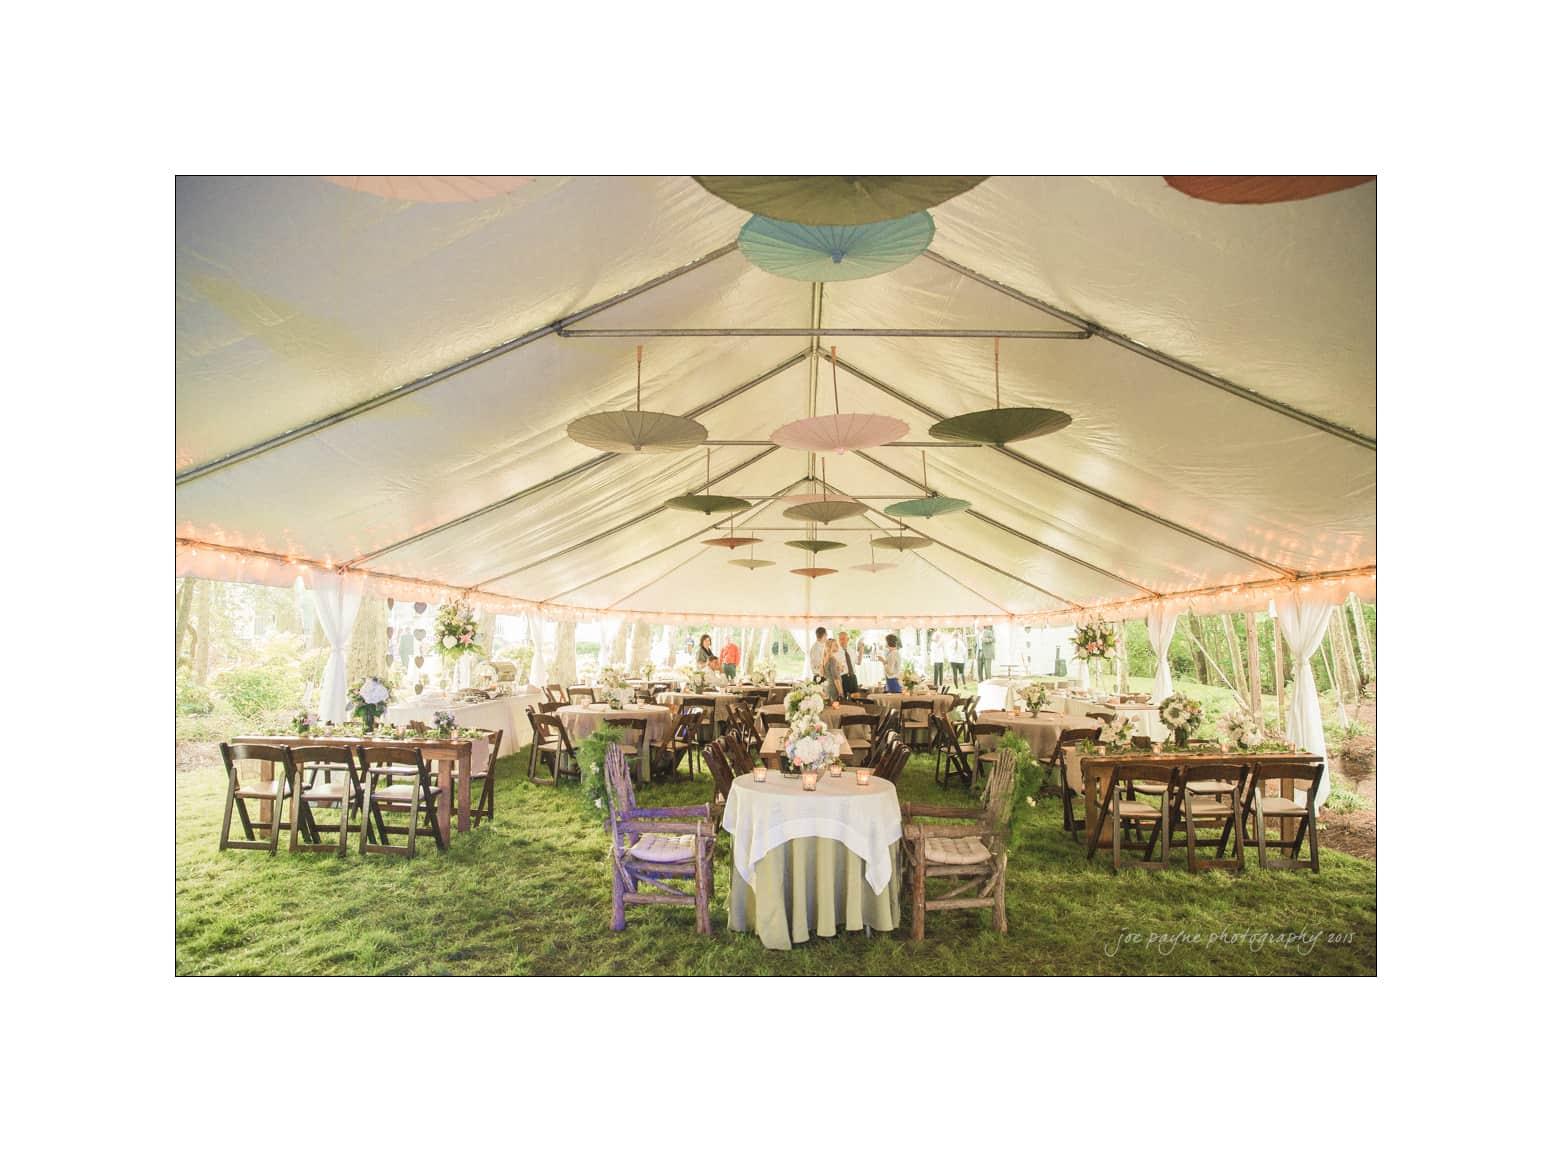 nc wedding photographer backyard reception tent interior